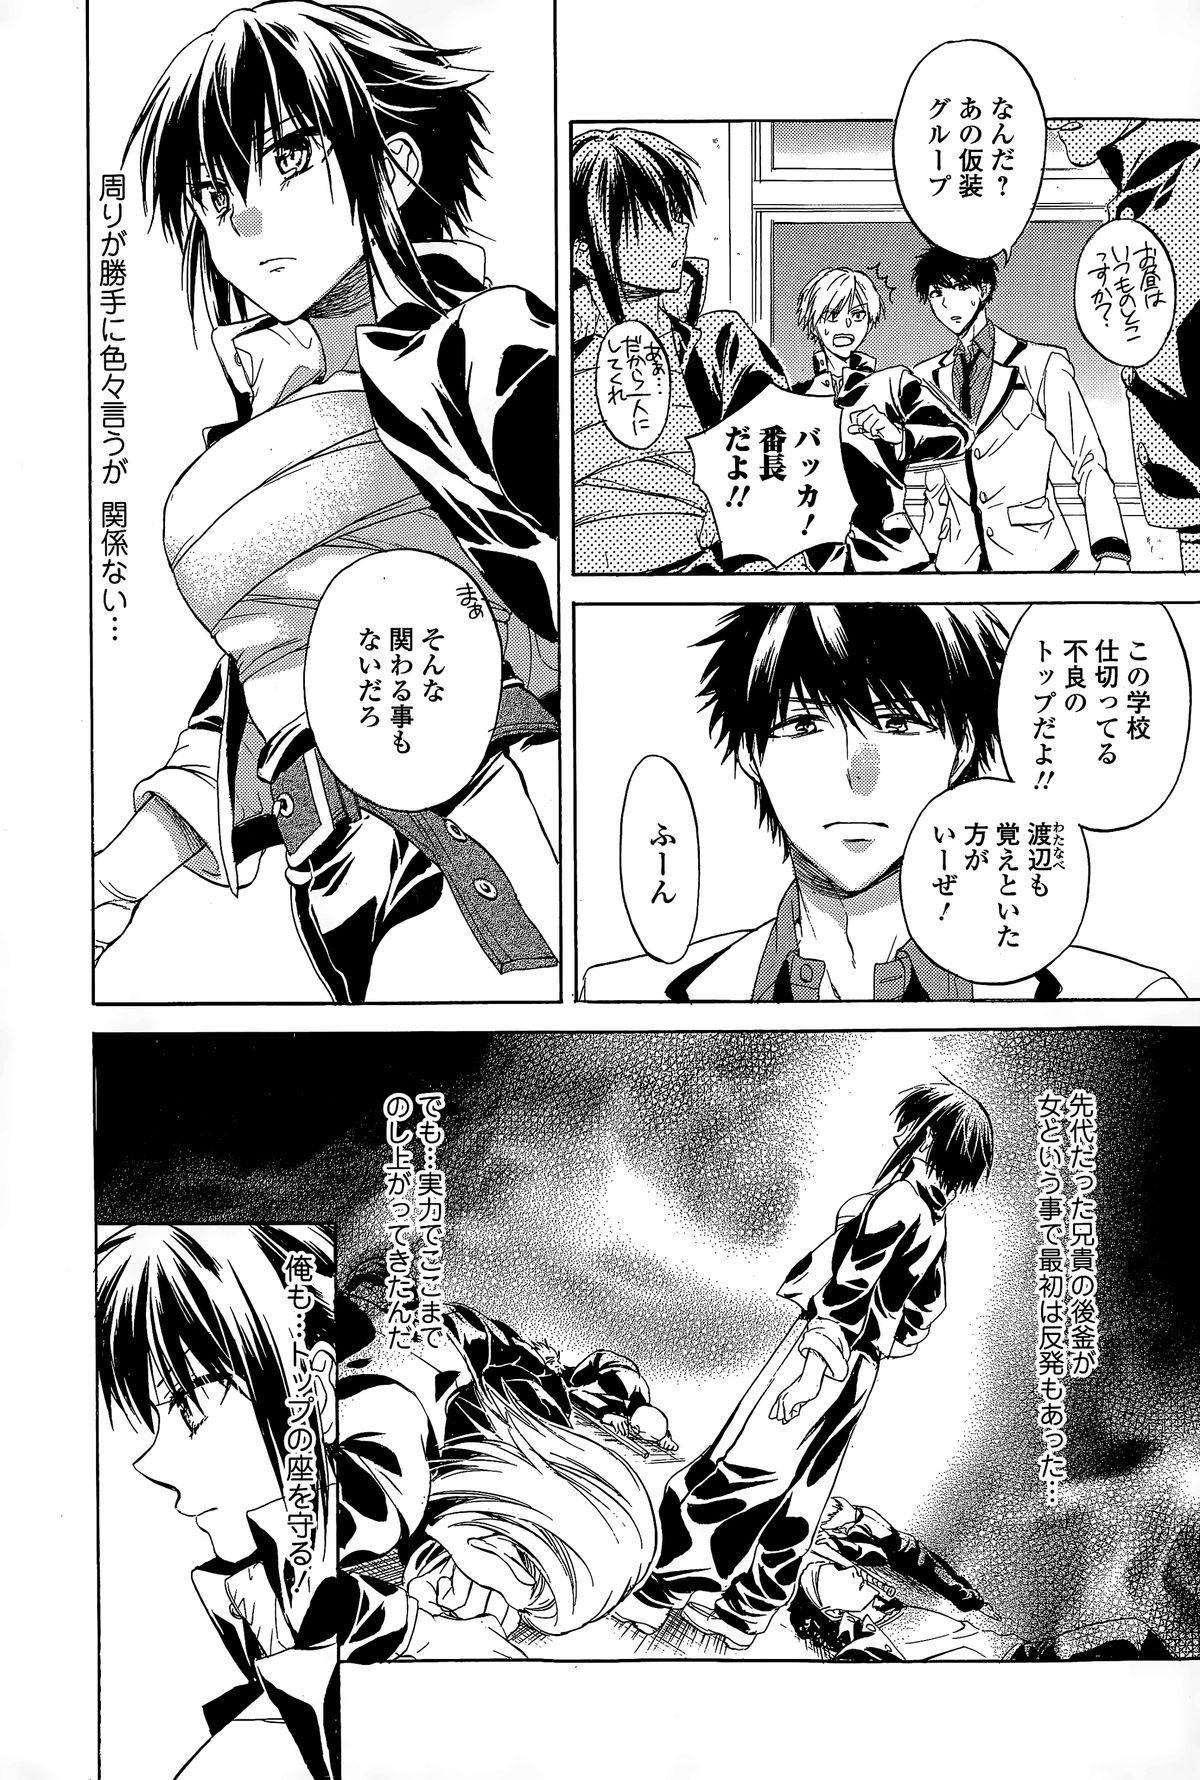 Comic Toutetsu 2015-02 Vol. 3 101